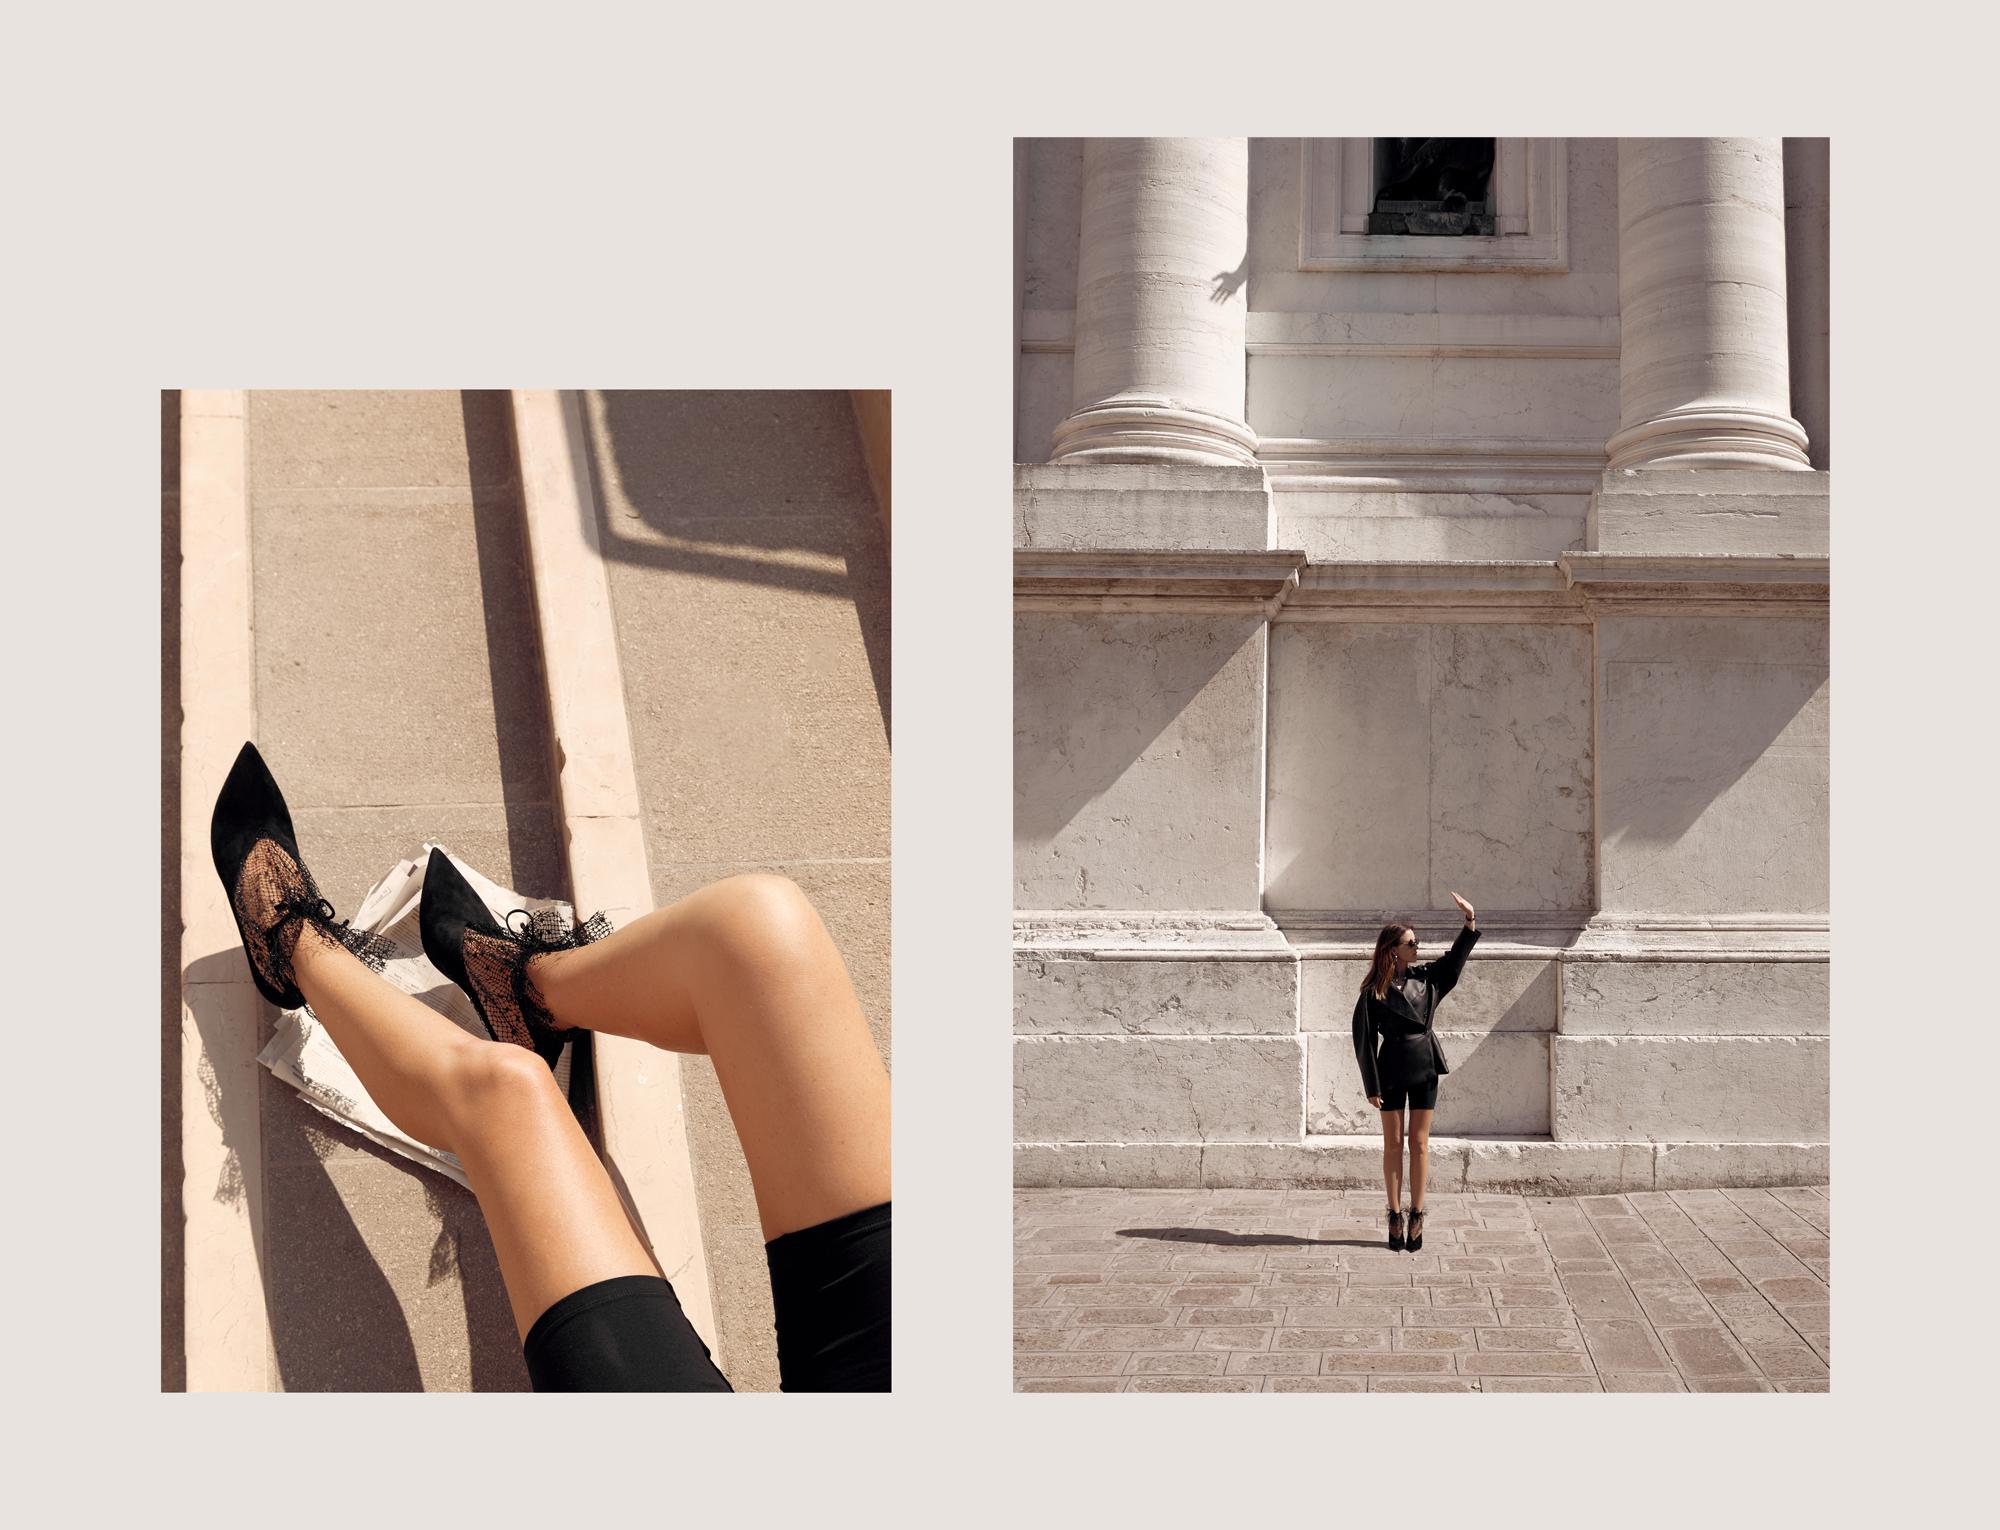 Leather Jacket, Bike Pants, Jimmy Choo Heels, Shoes, Venice, Travel, Photo Diary